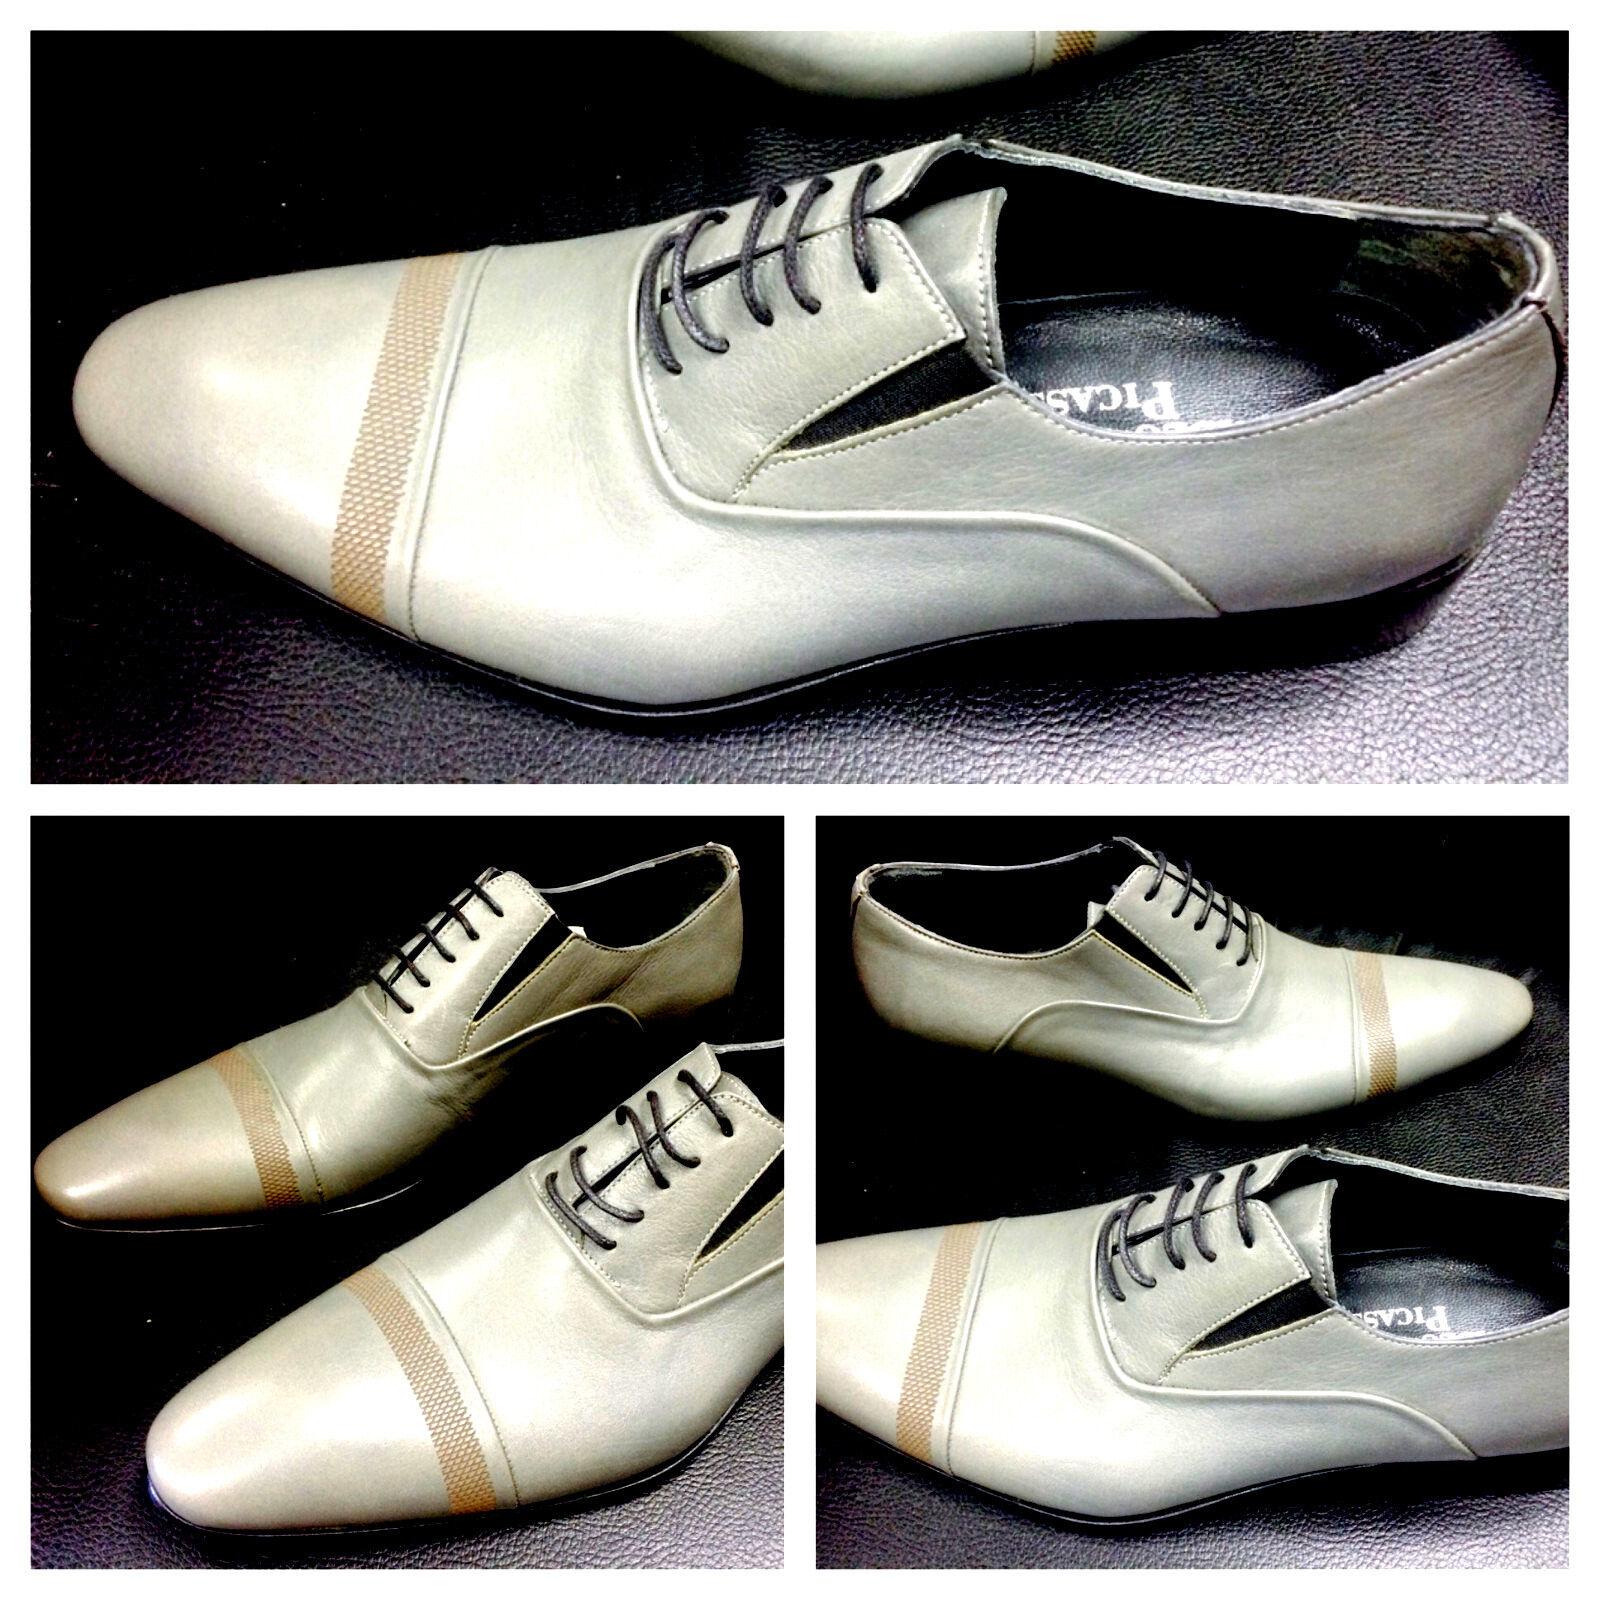 Pablo Picasso Italiana Diseñador Zapatos Handmade gris Negocios Zapatos